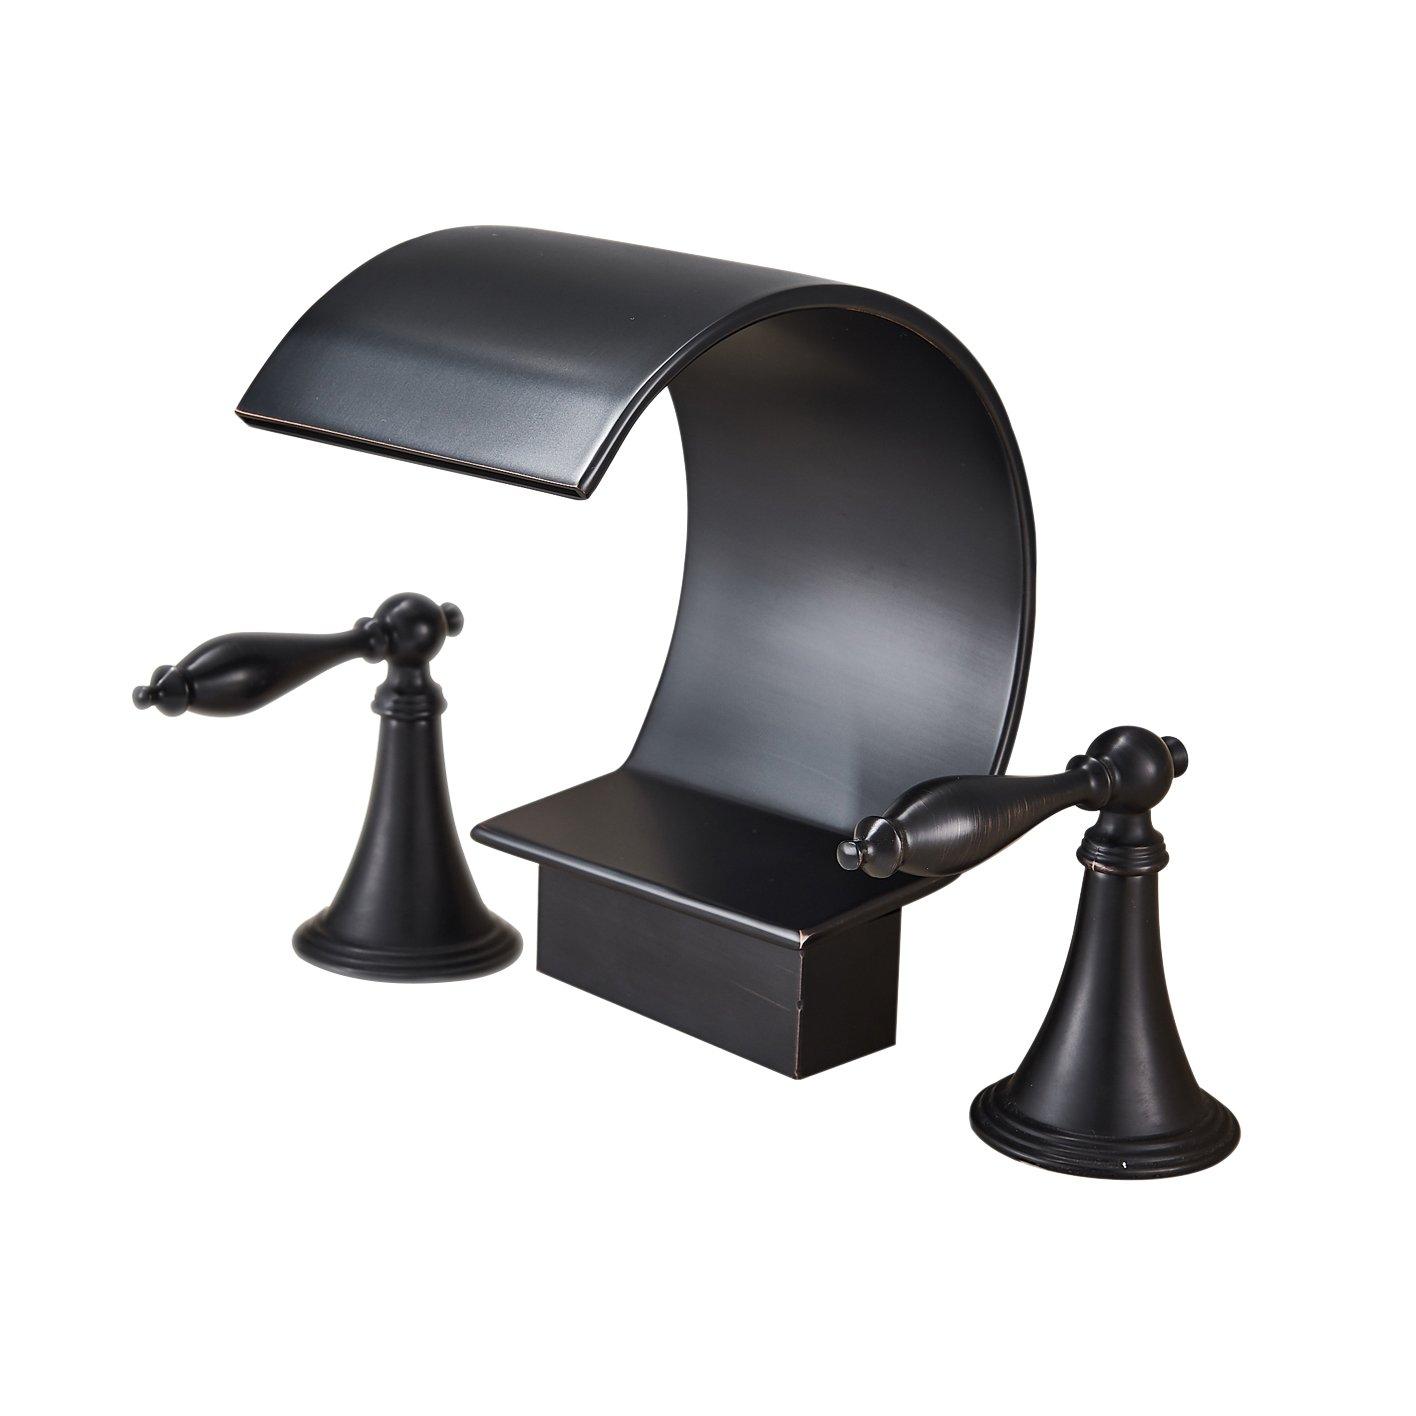 Rozin Oil Rubbed Bronze Bathtub Faucet Dual Handles Basin Mixer Tap ...